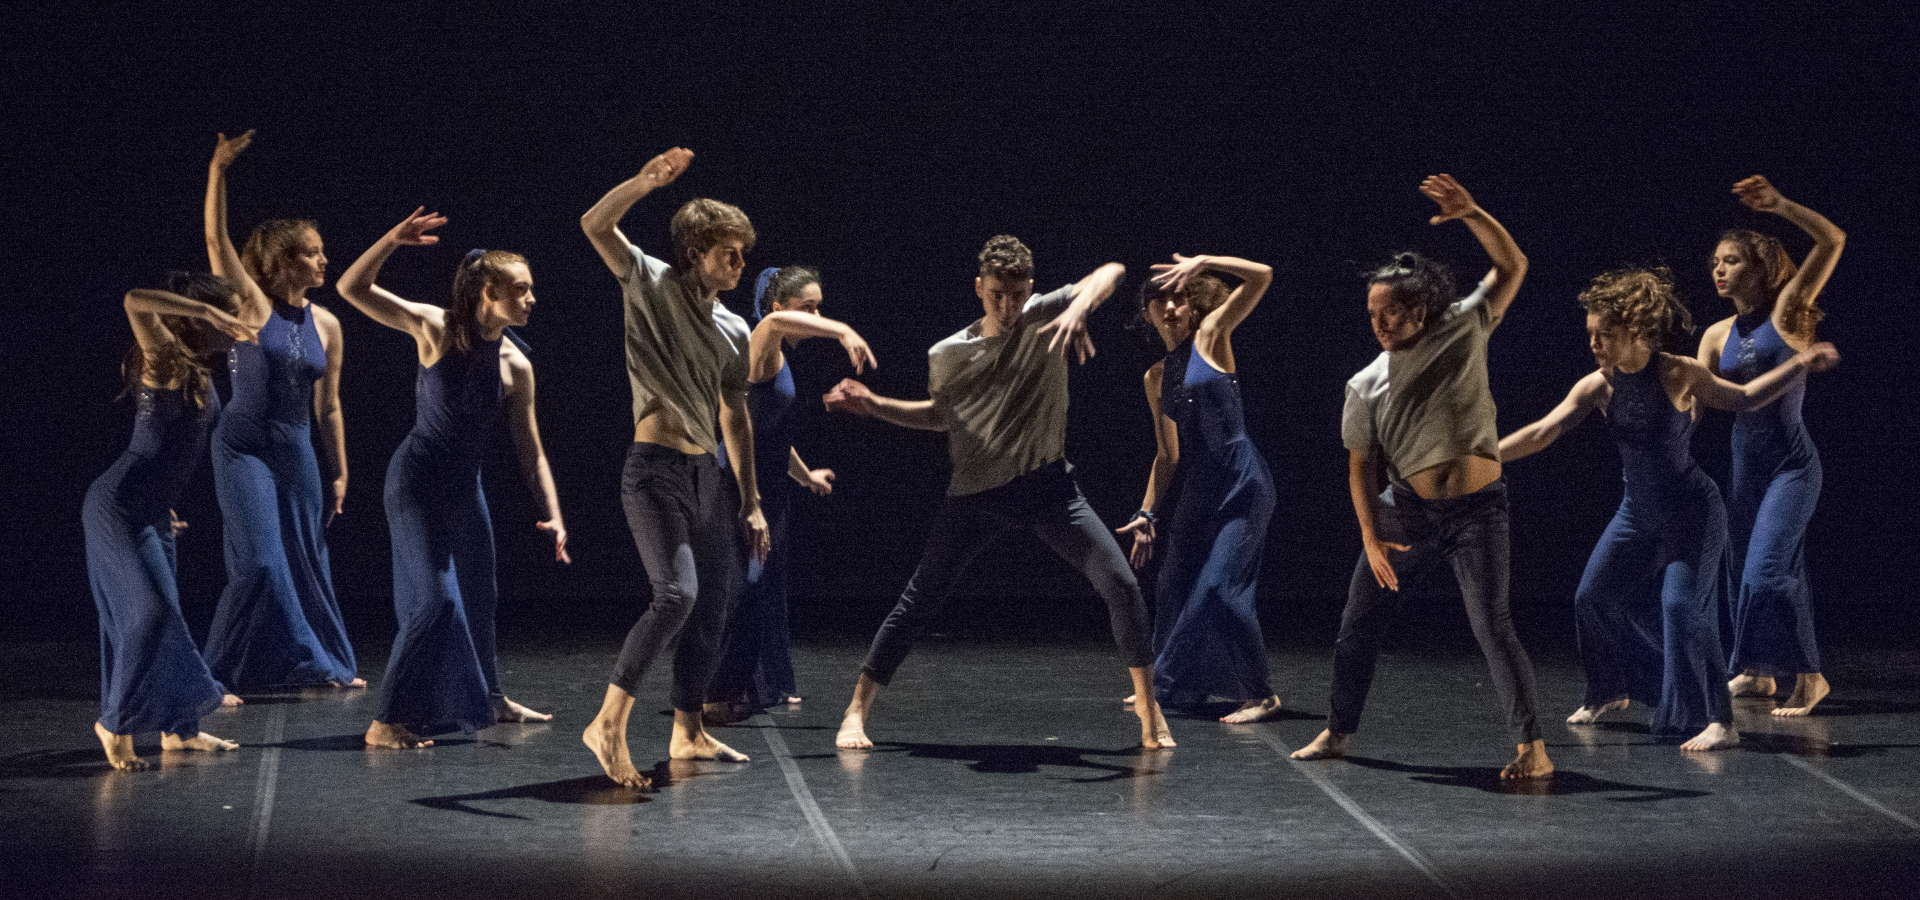 Clases Danza Contemporánea Ourense - COPPELIA Escuela Danza Nati Fleta